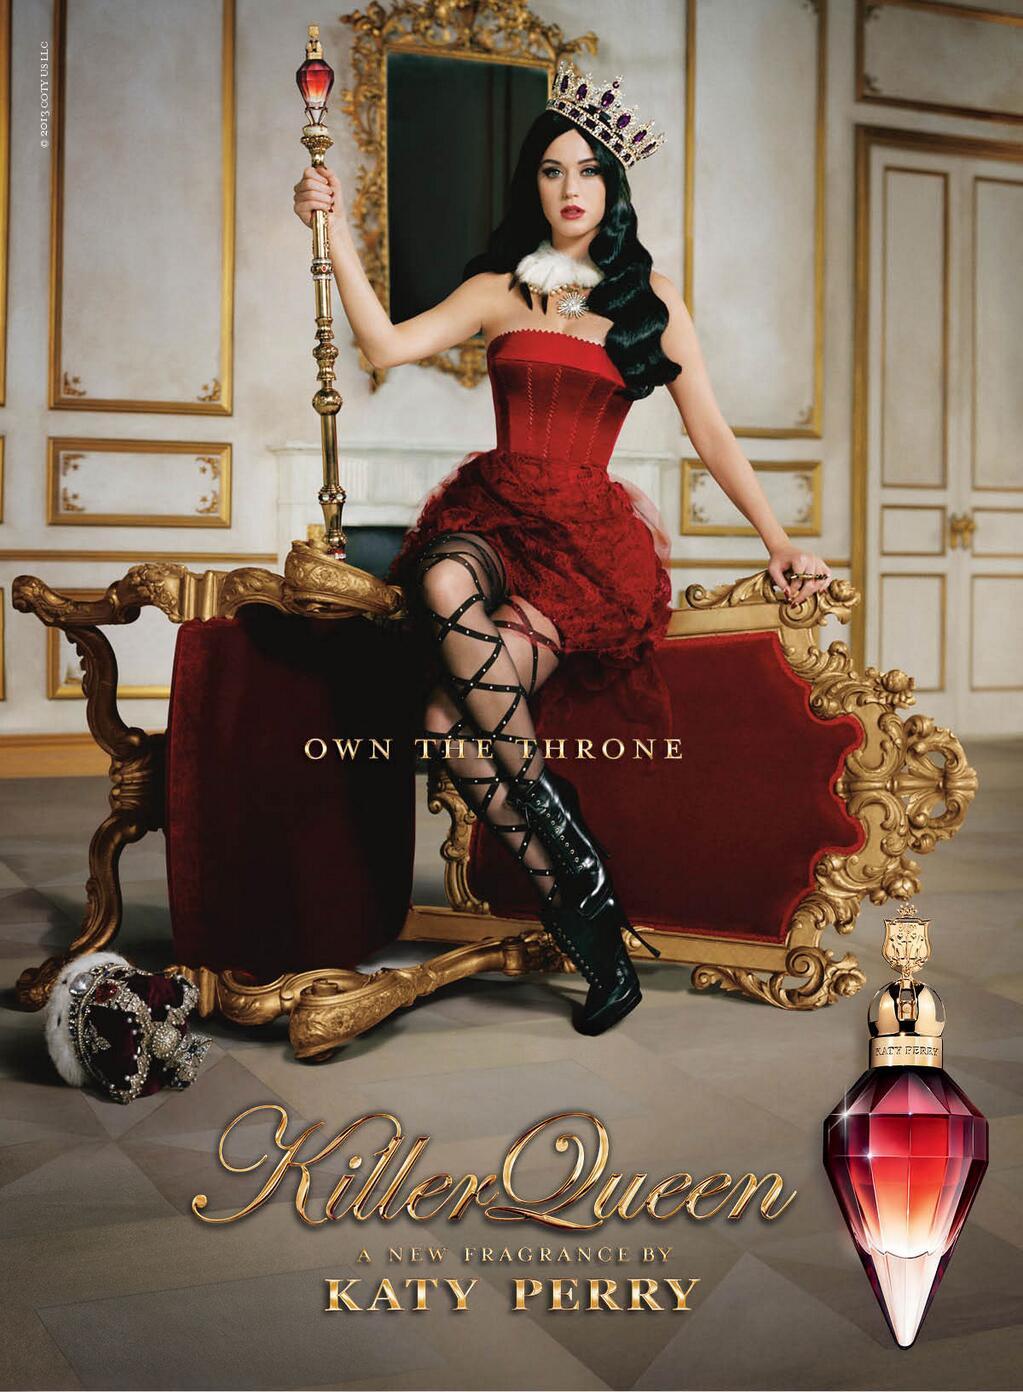 katy-perry-killer-queen-throne.jpg